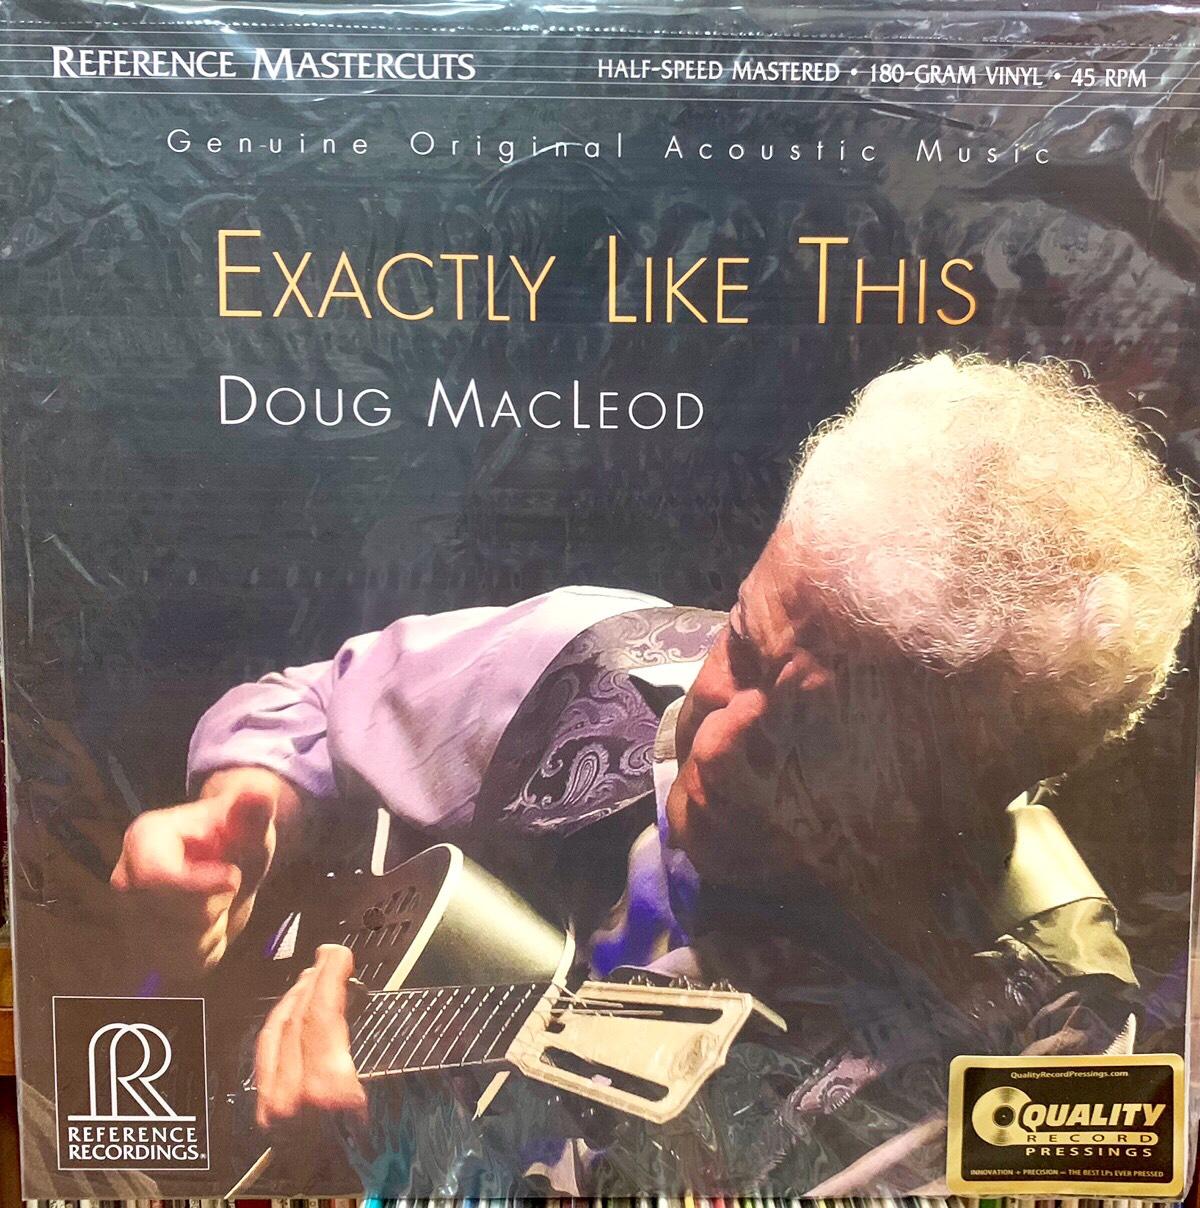 dia-than-lp-exactly-like-thi-doug-macleod